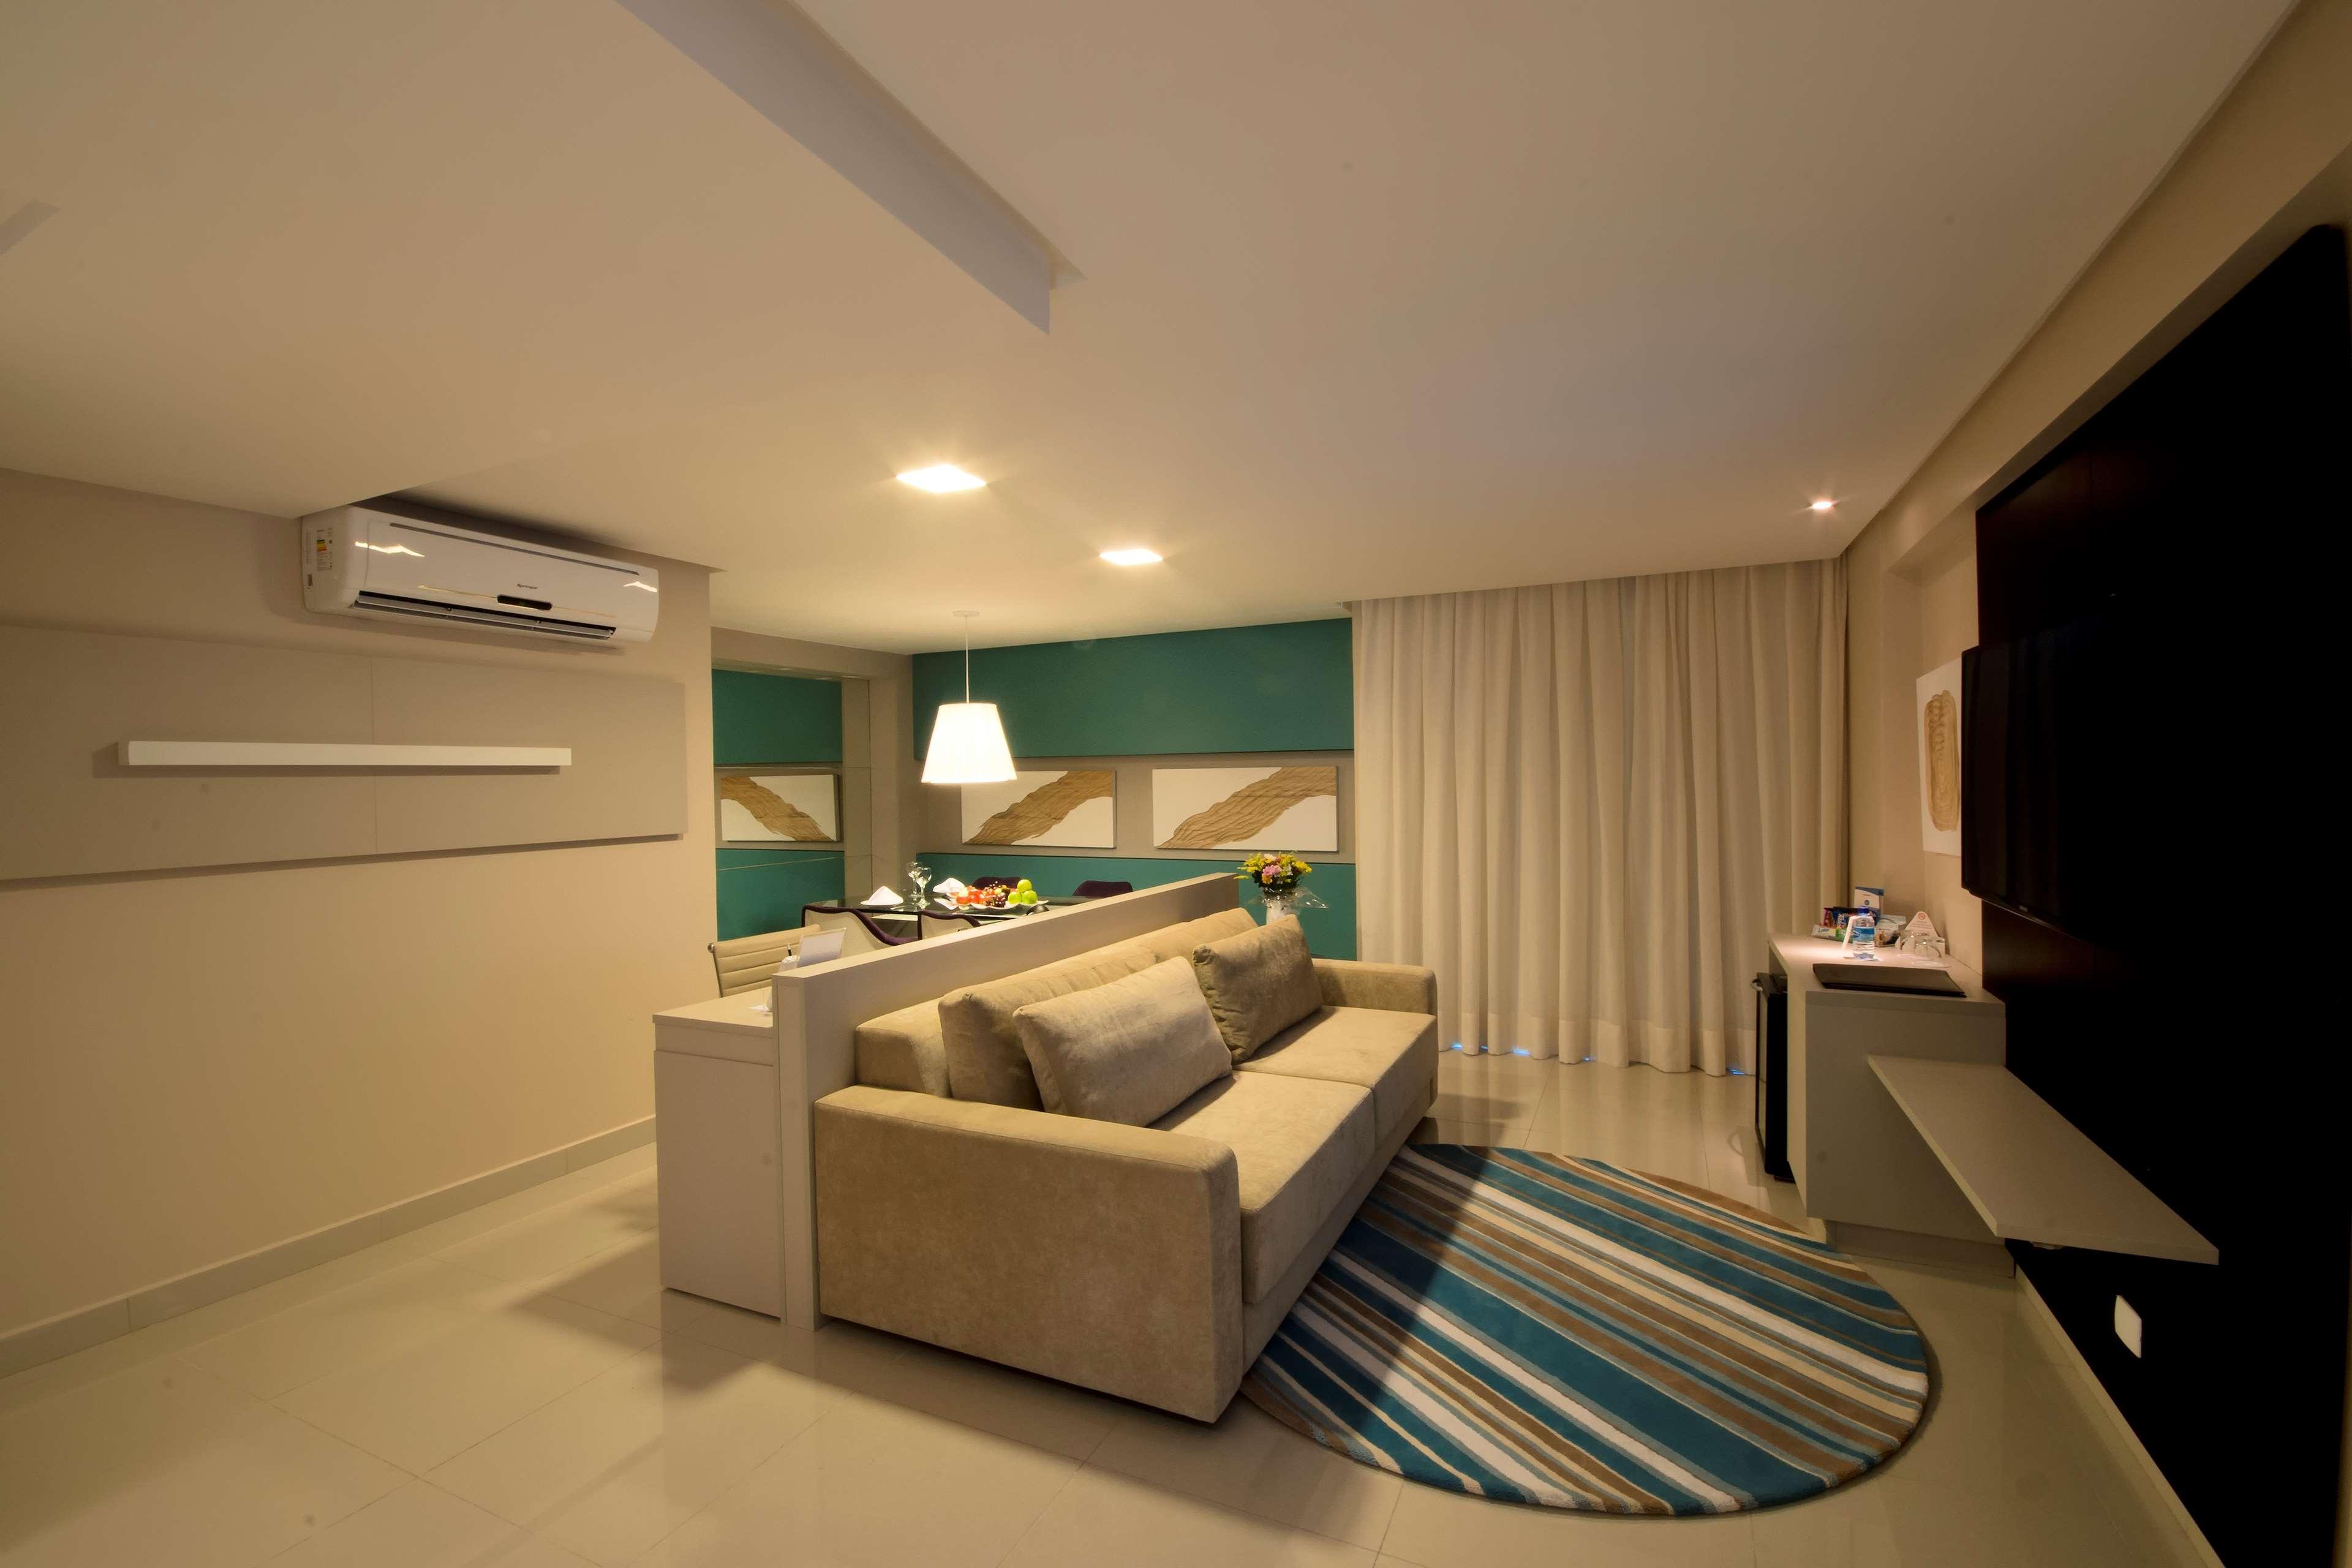 Radisson Hotel Recife